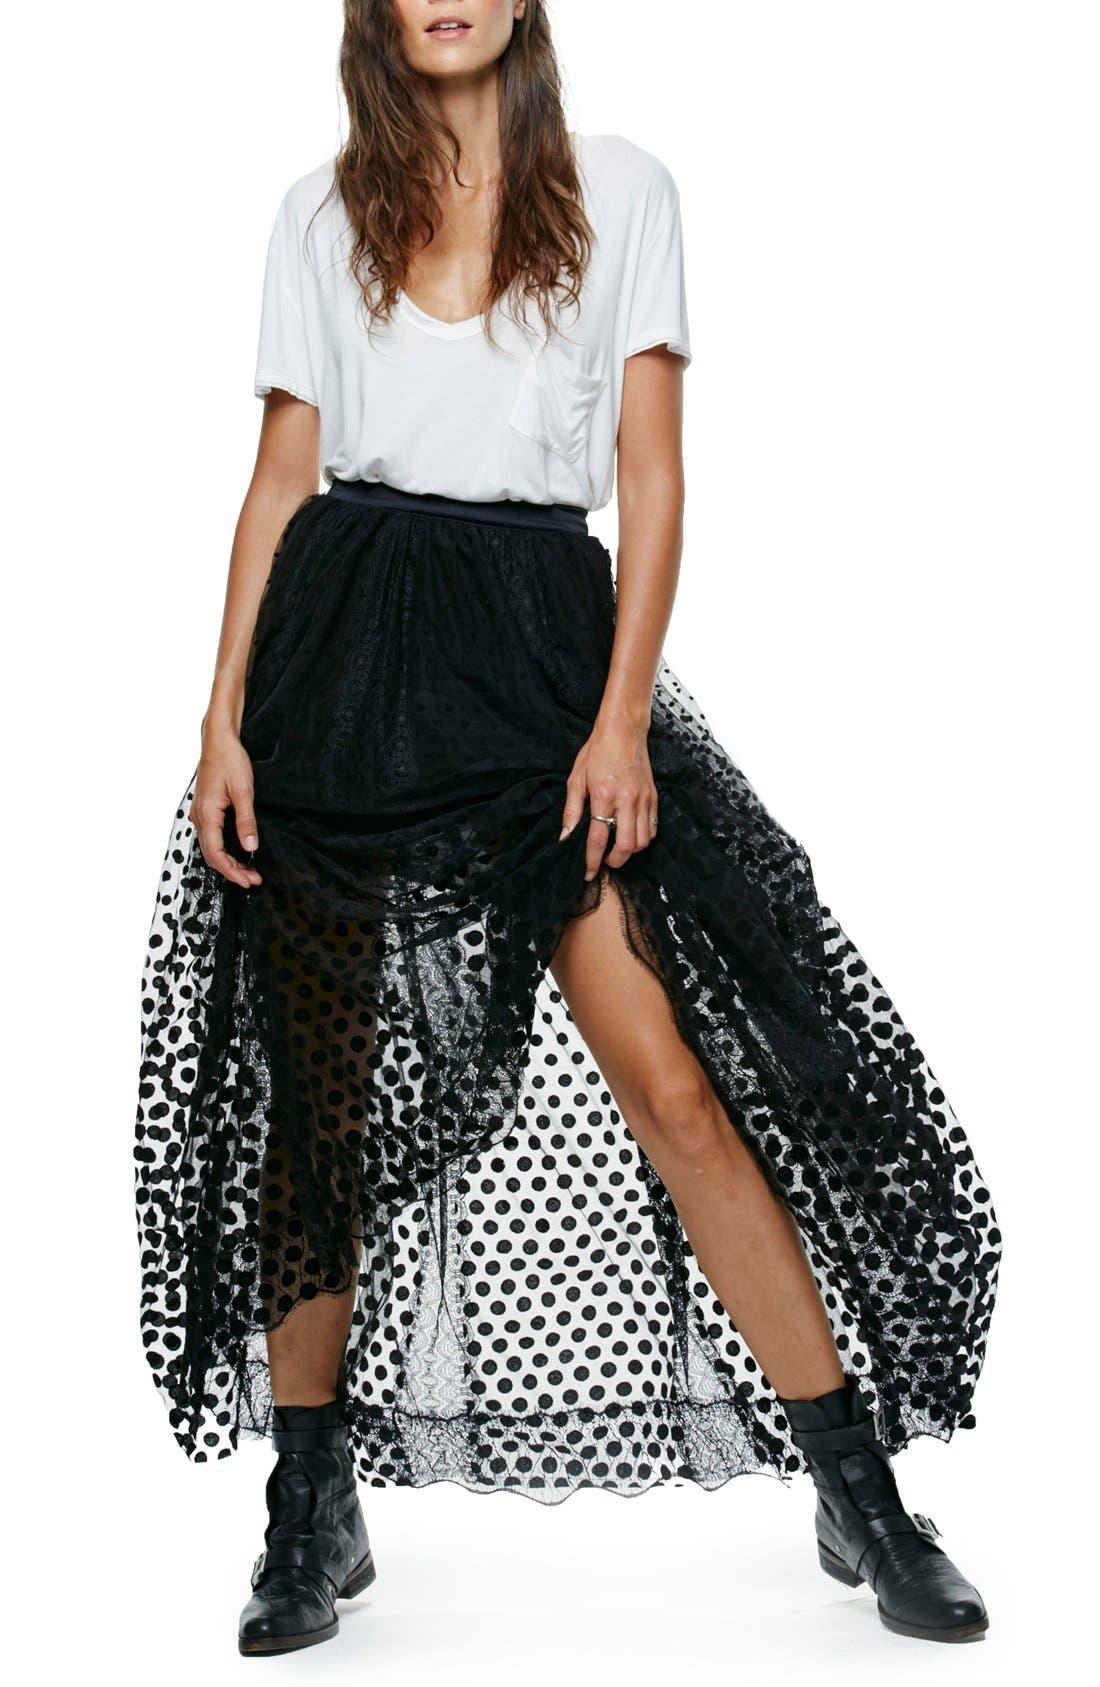 Alternate Image 1 Selected - Free People Dreaming Of You Mesh Tutu Skirt